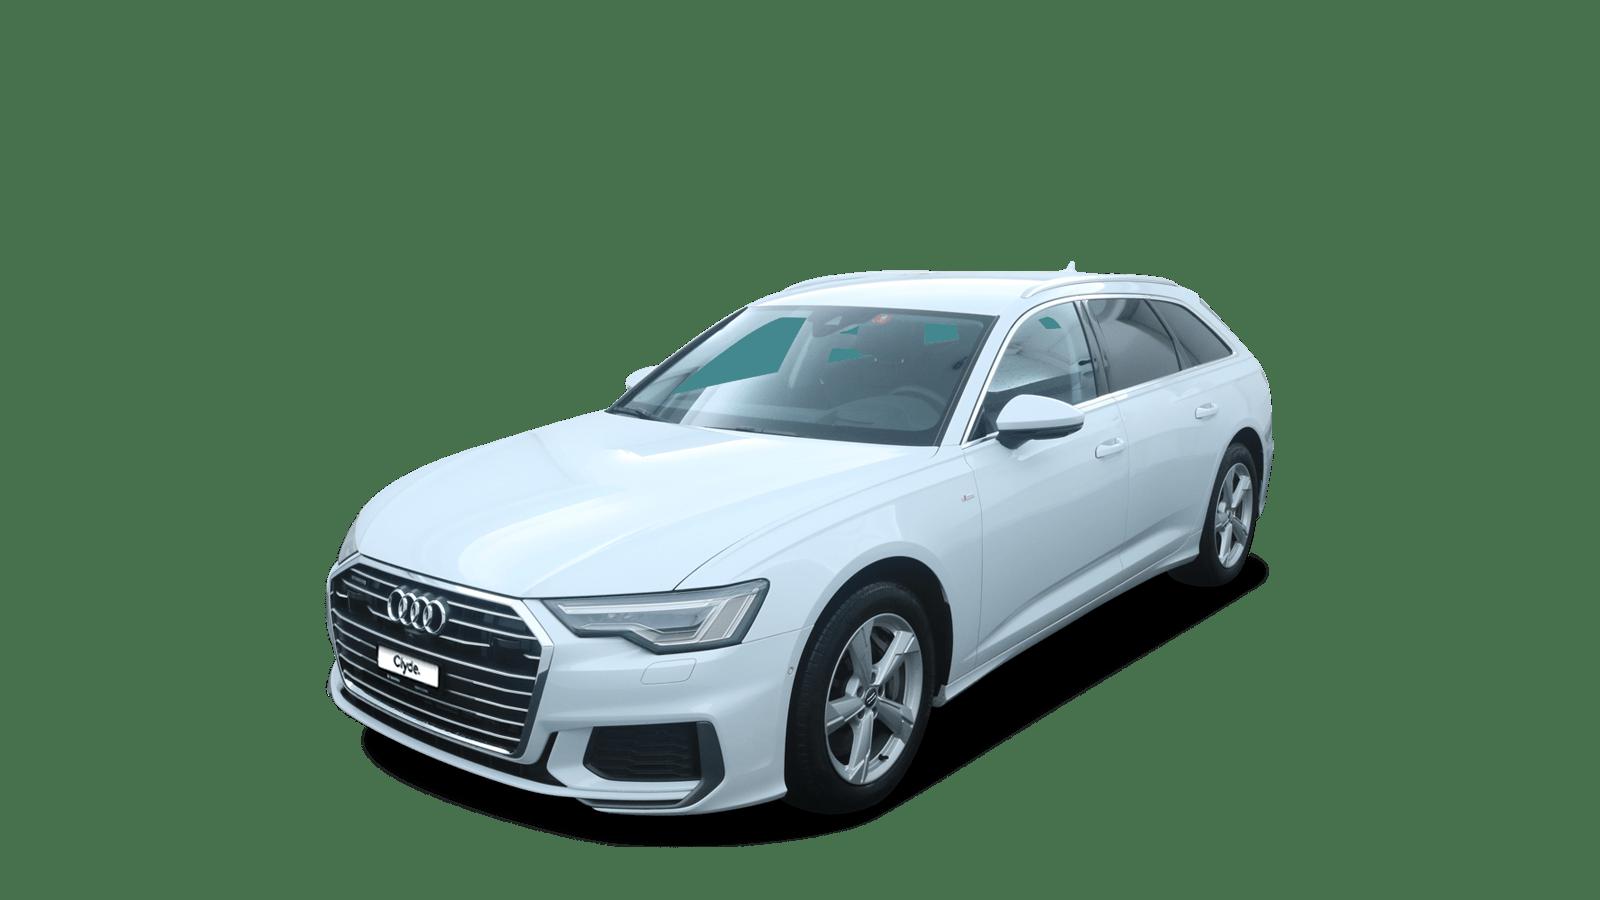 Audi A6 Avant White front - Clyde car subscription